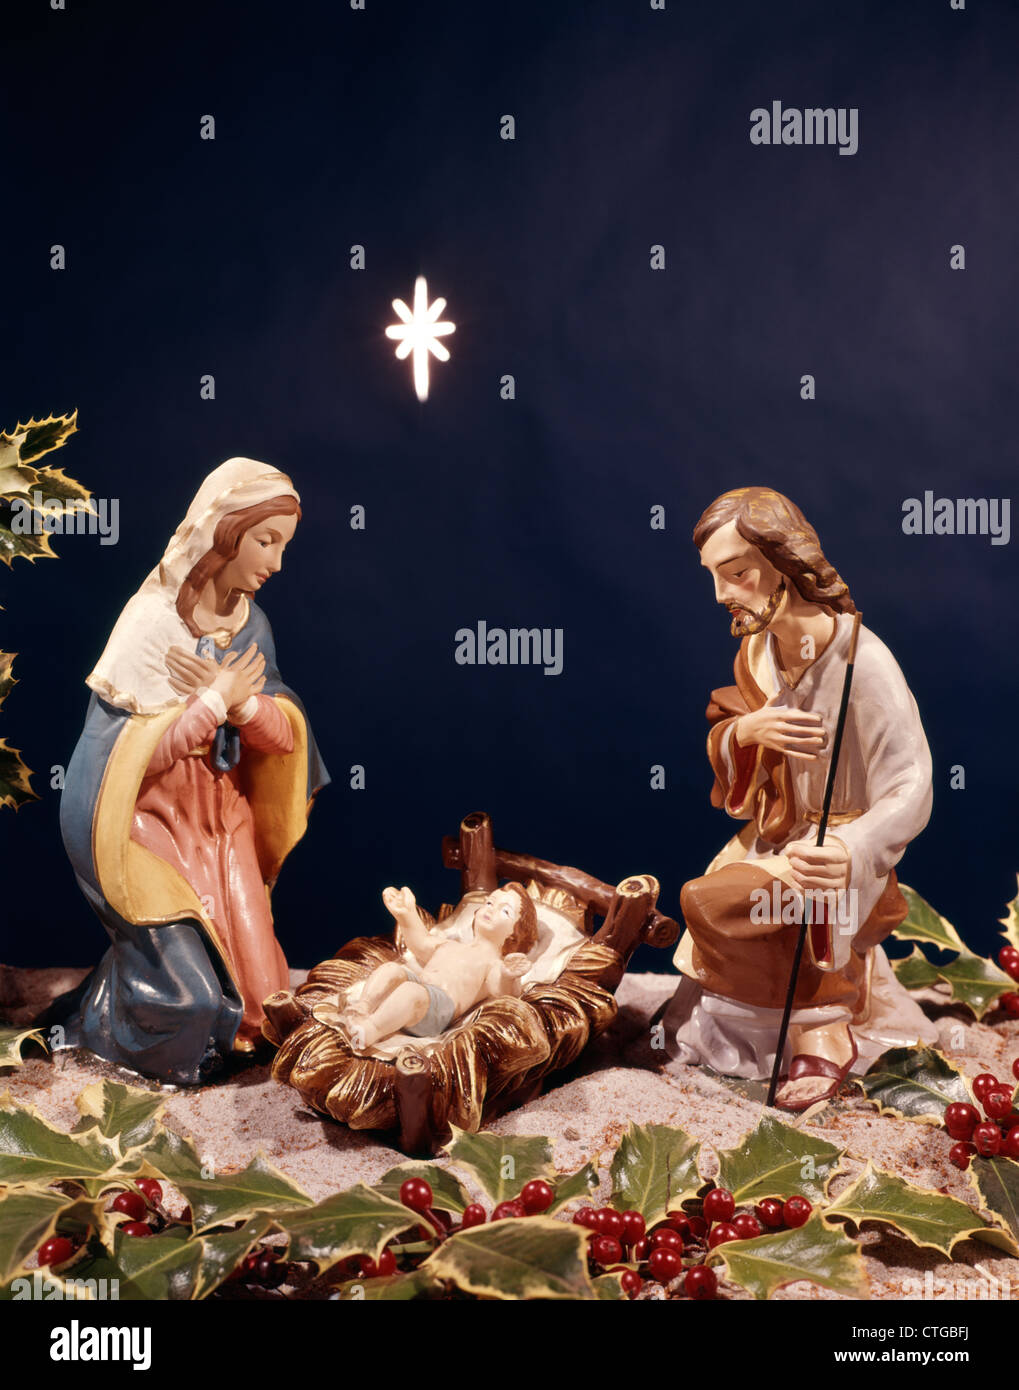 nativity star baby jesus in manager mary joseph stock photo